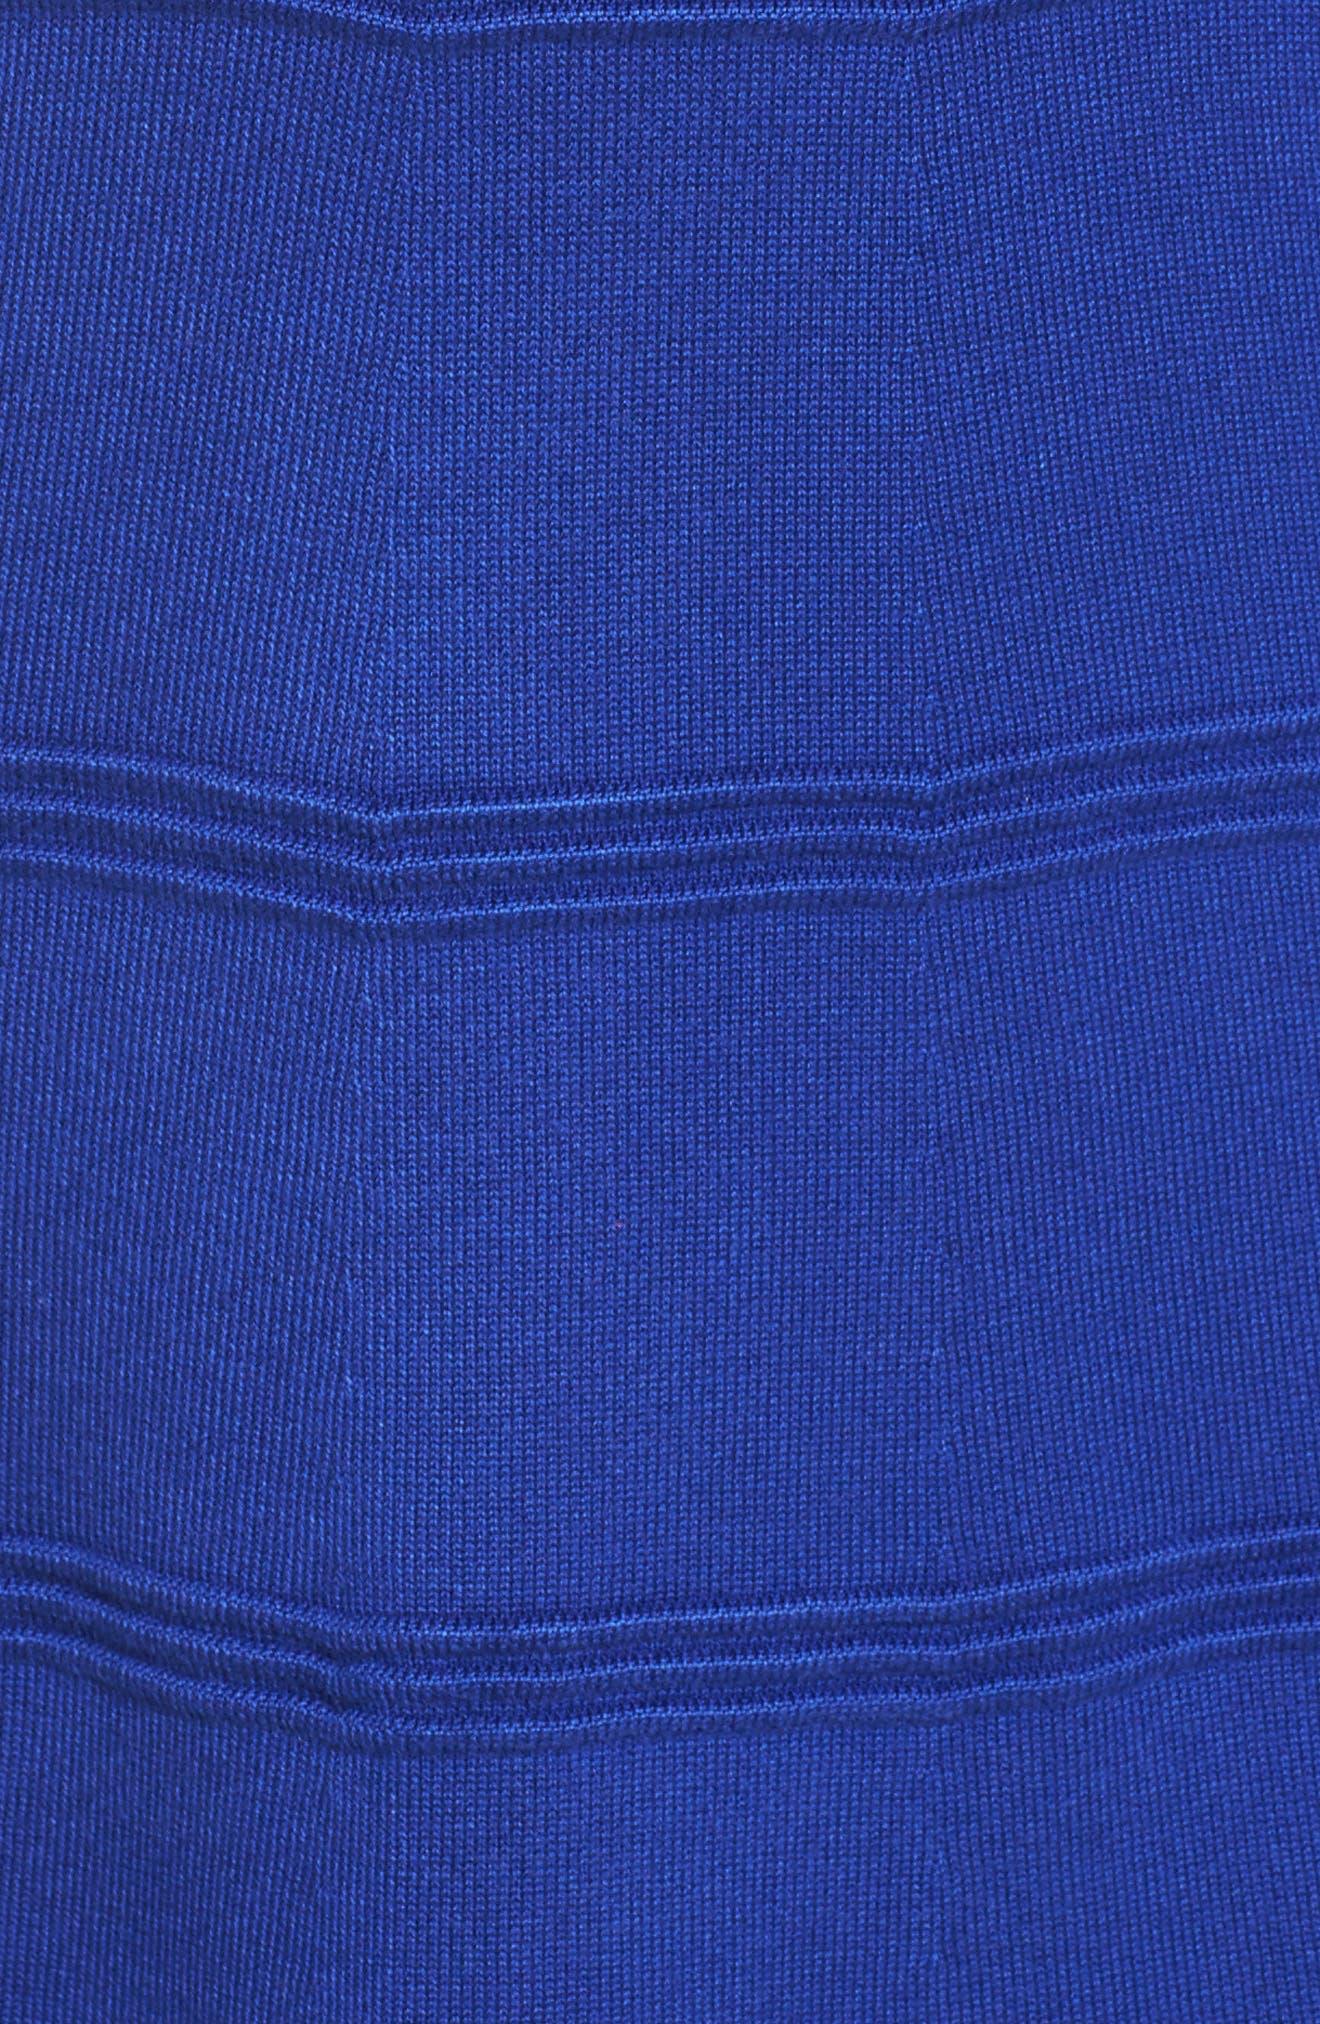 A-Line Sweater Dress,                             Alternate thumbnail 5, color,                             COBALT